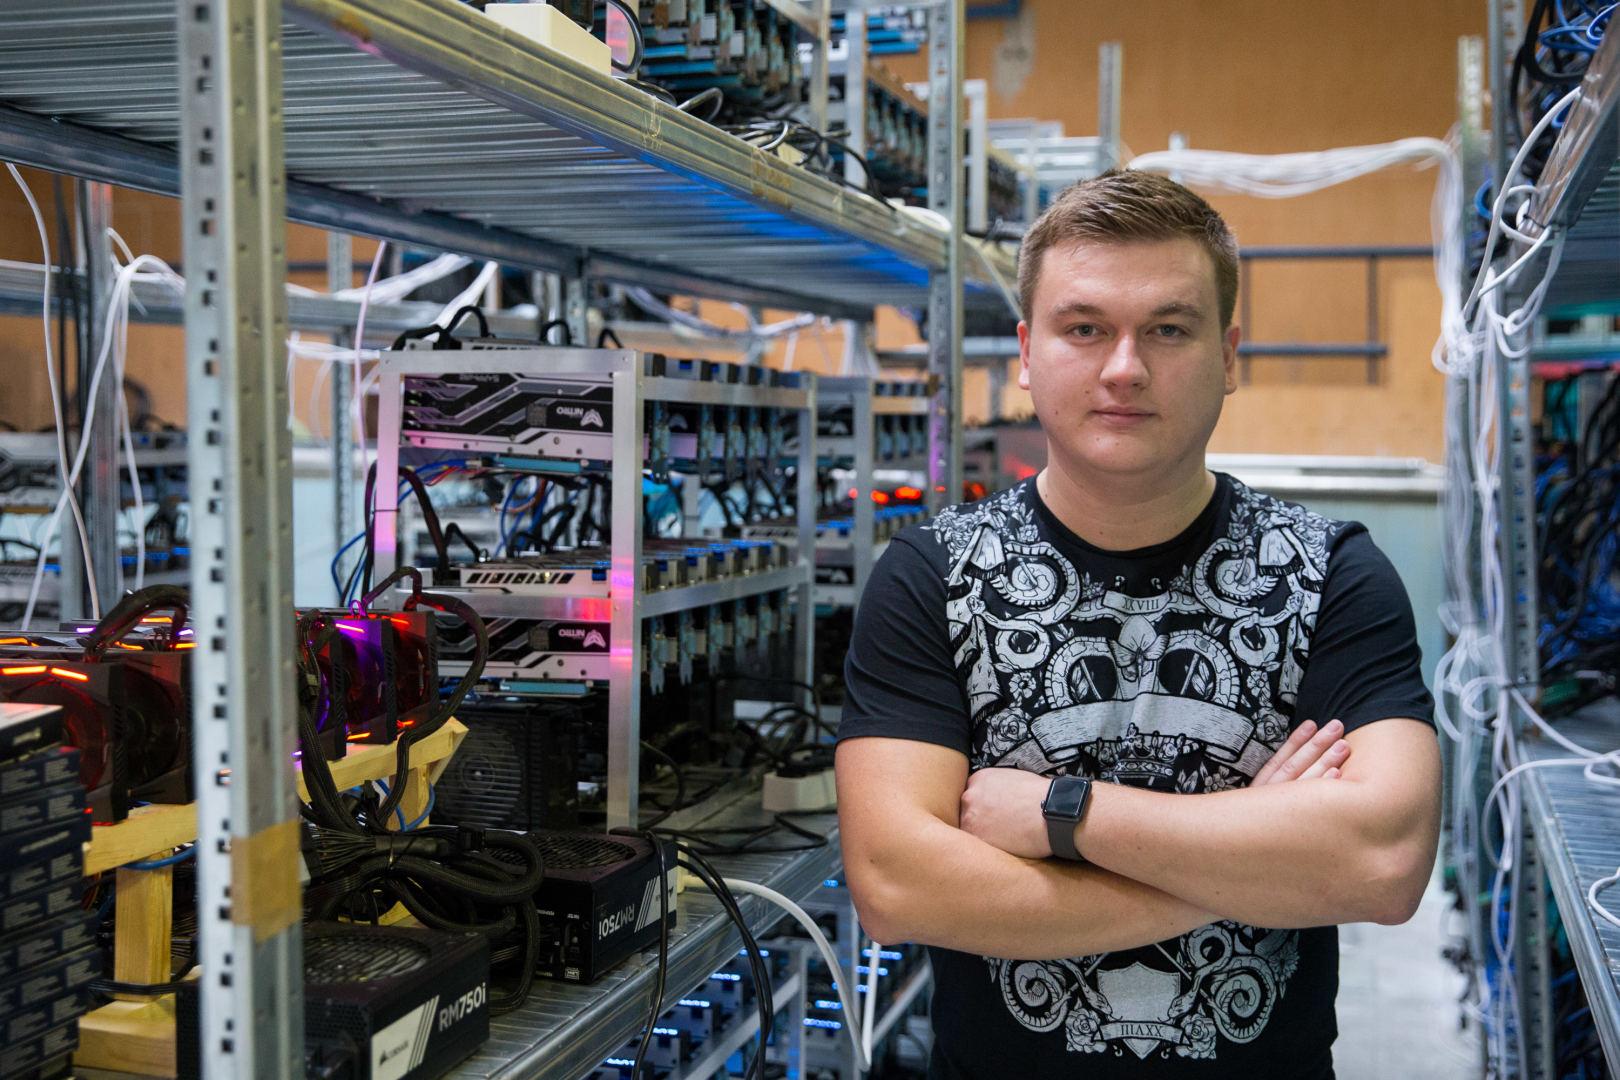 bitkoinų gamykla)